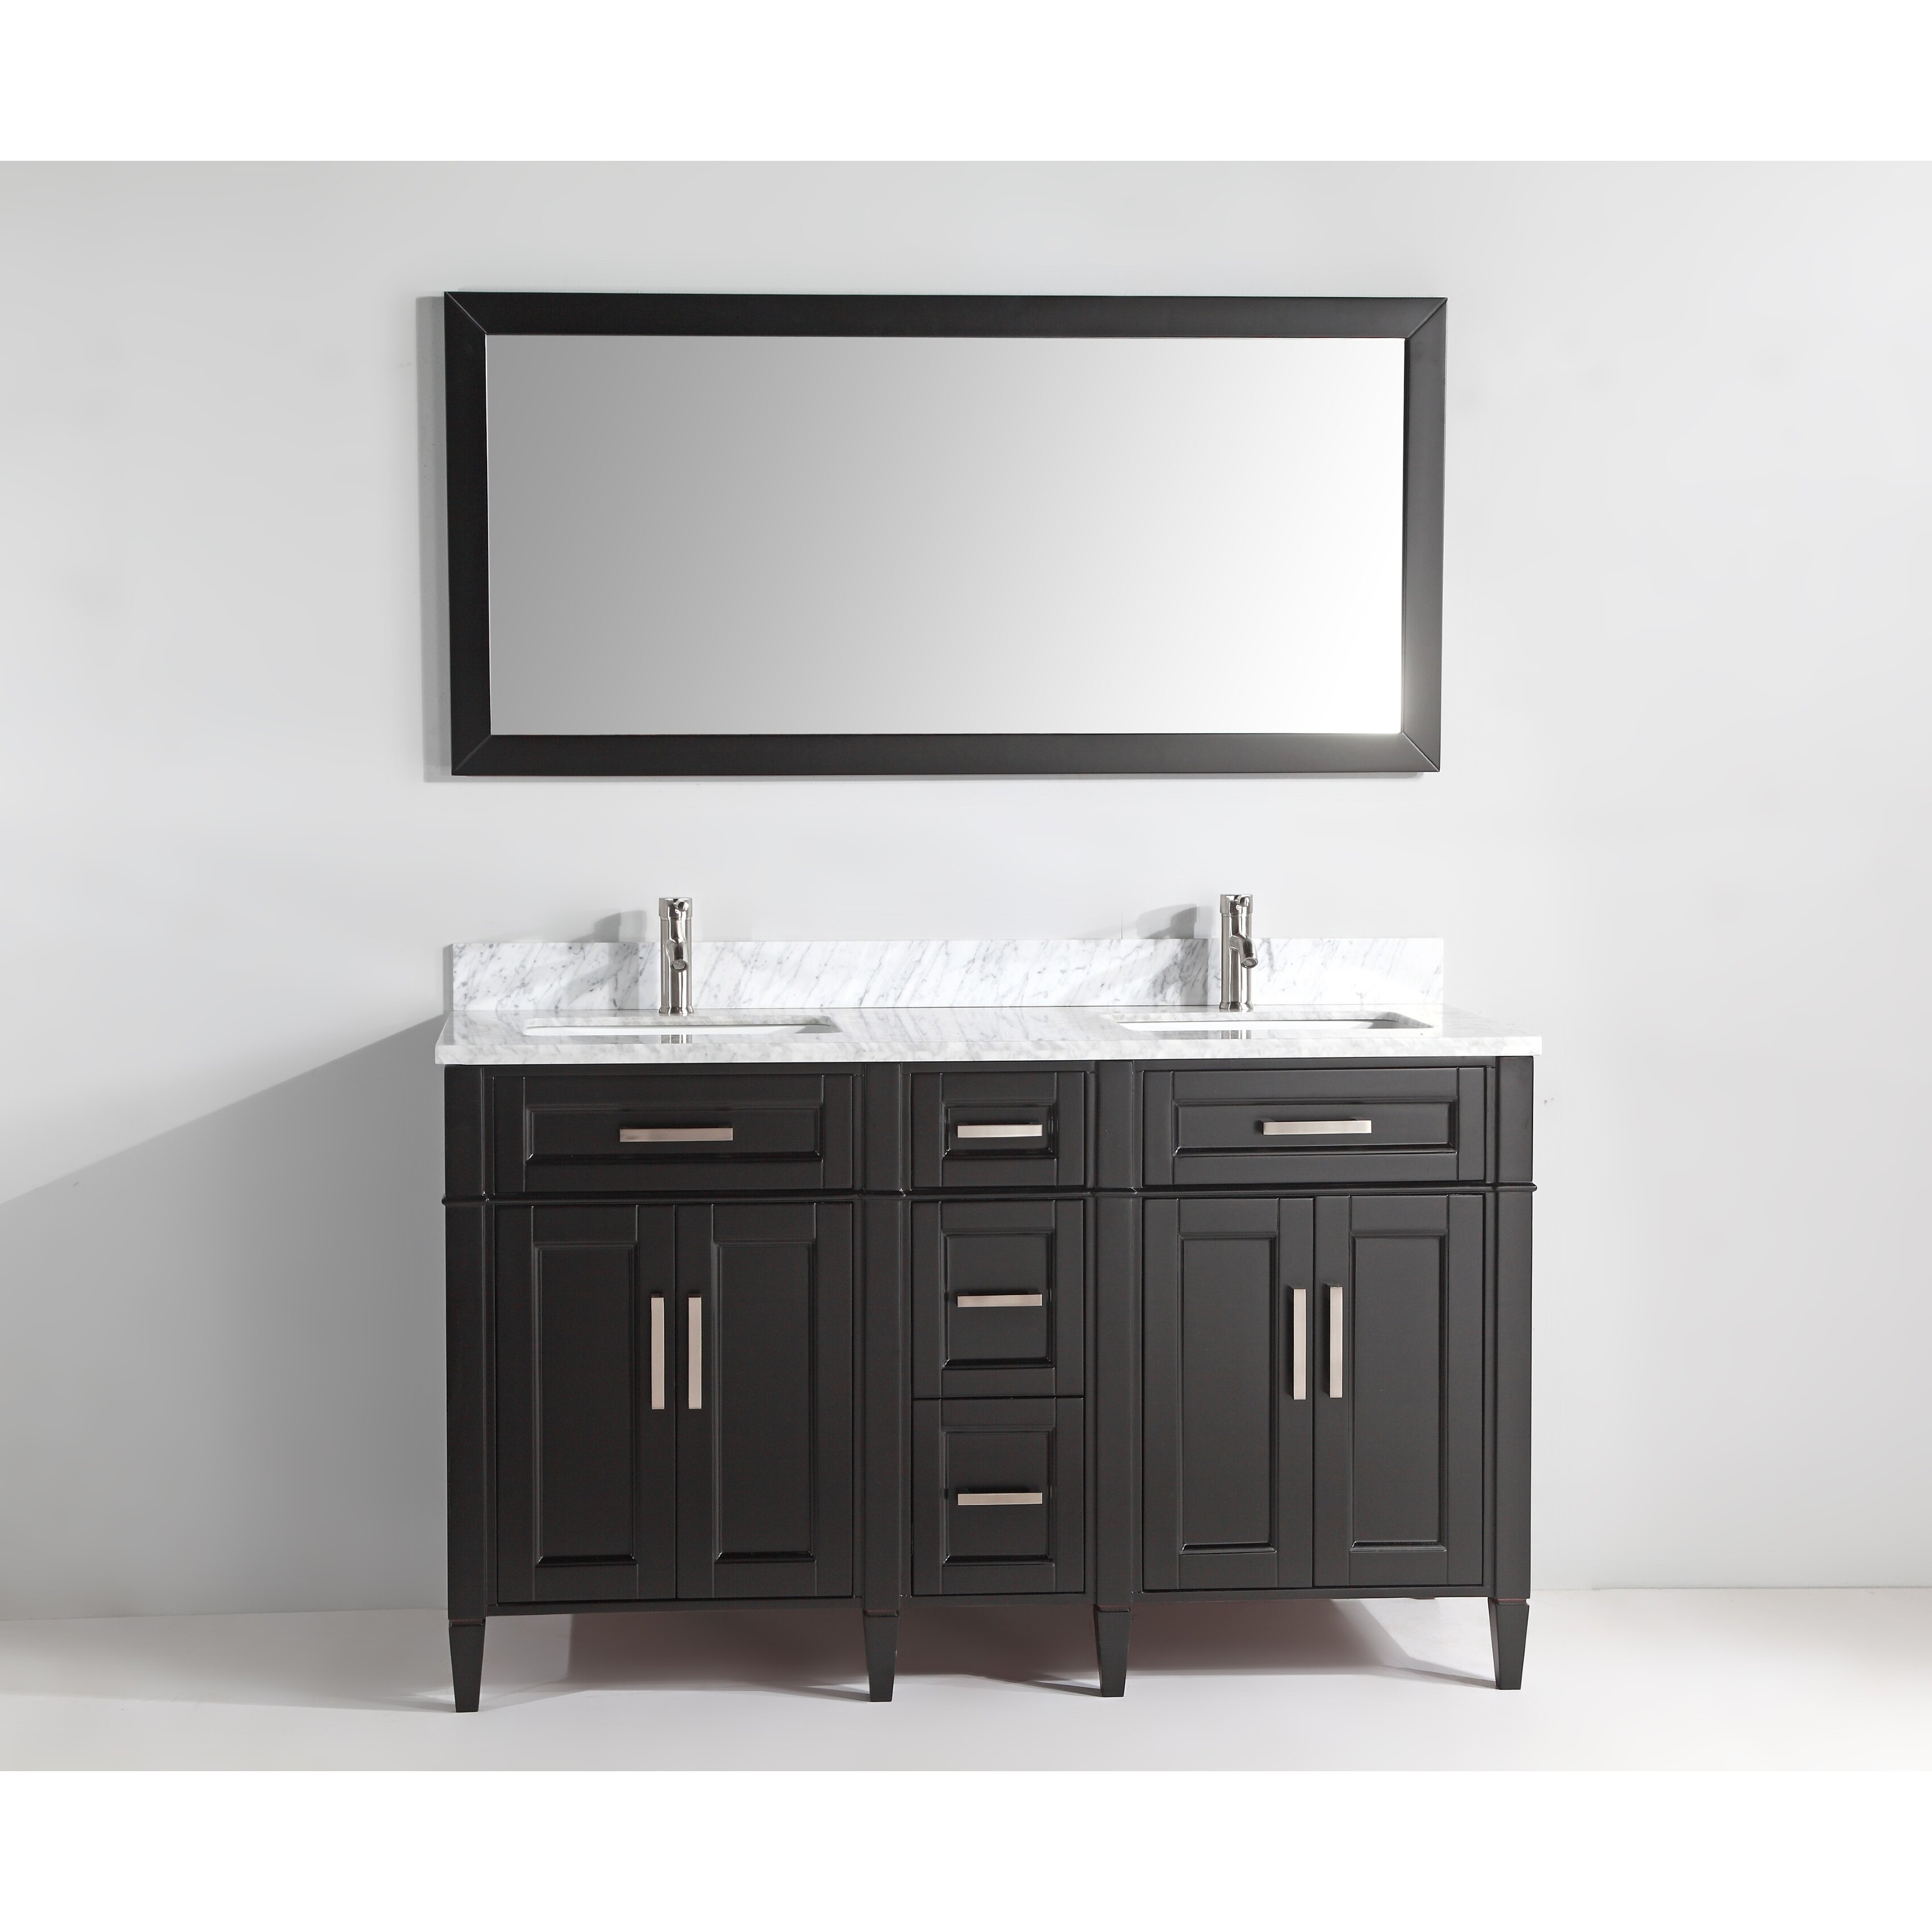 Vanityart 60 double bathroom vanity set with mirror wayfair for Vanity set with mirror